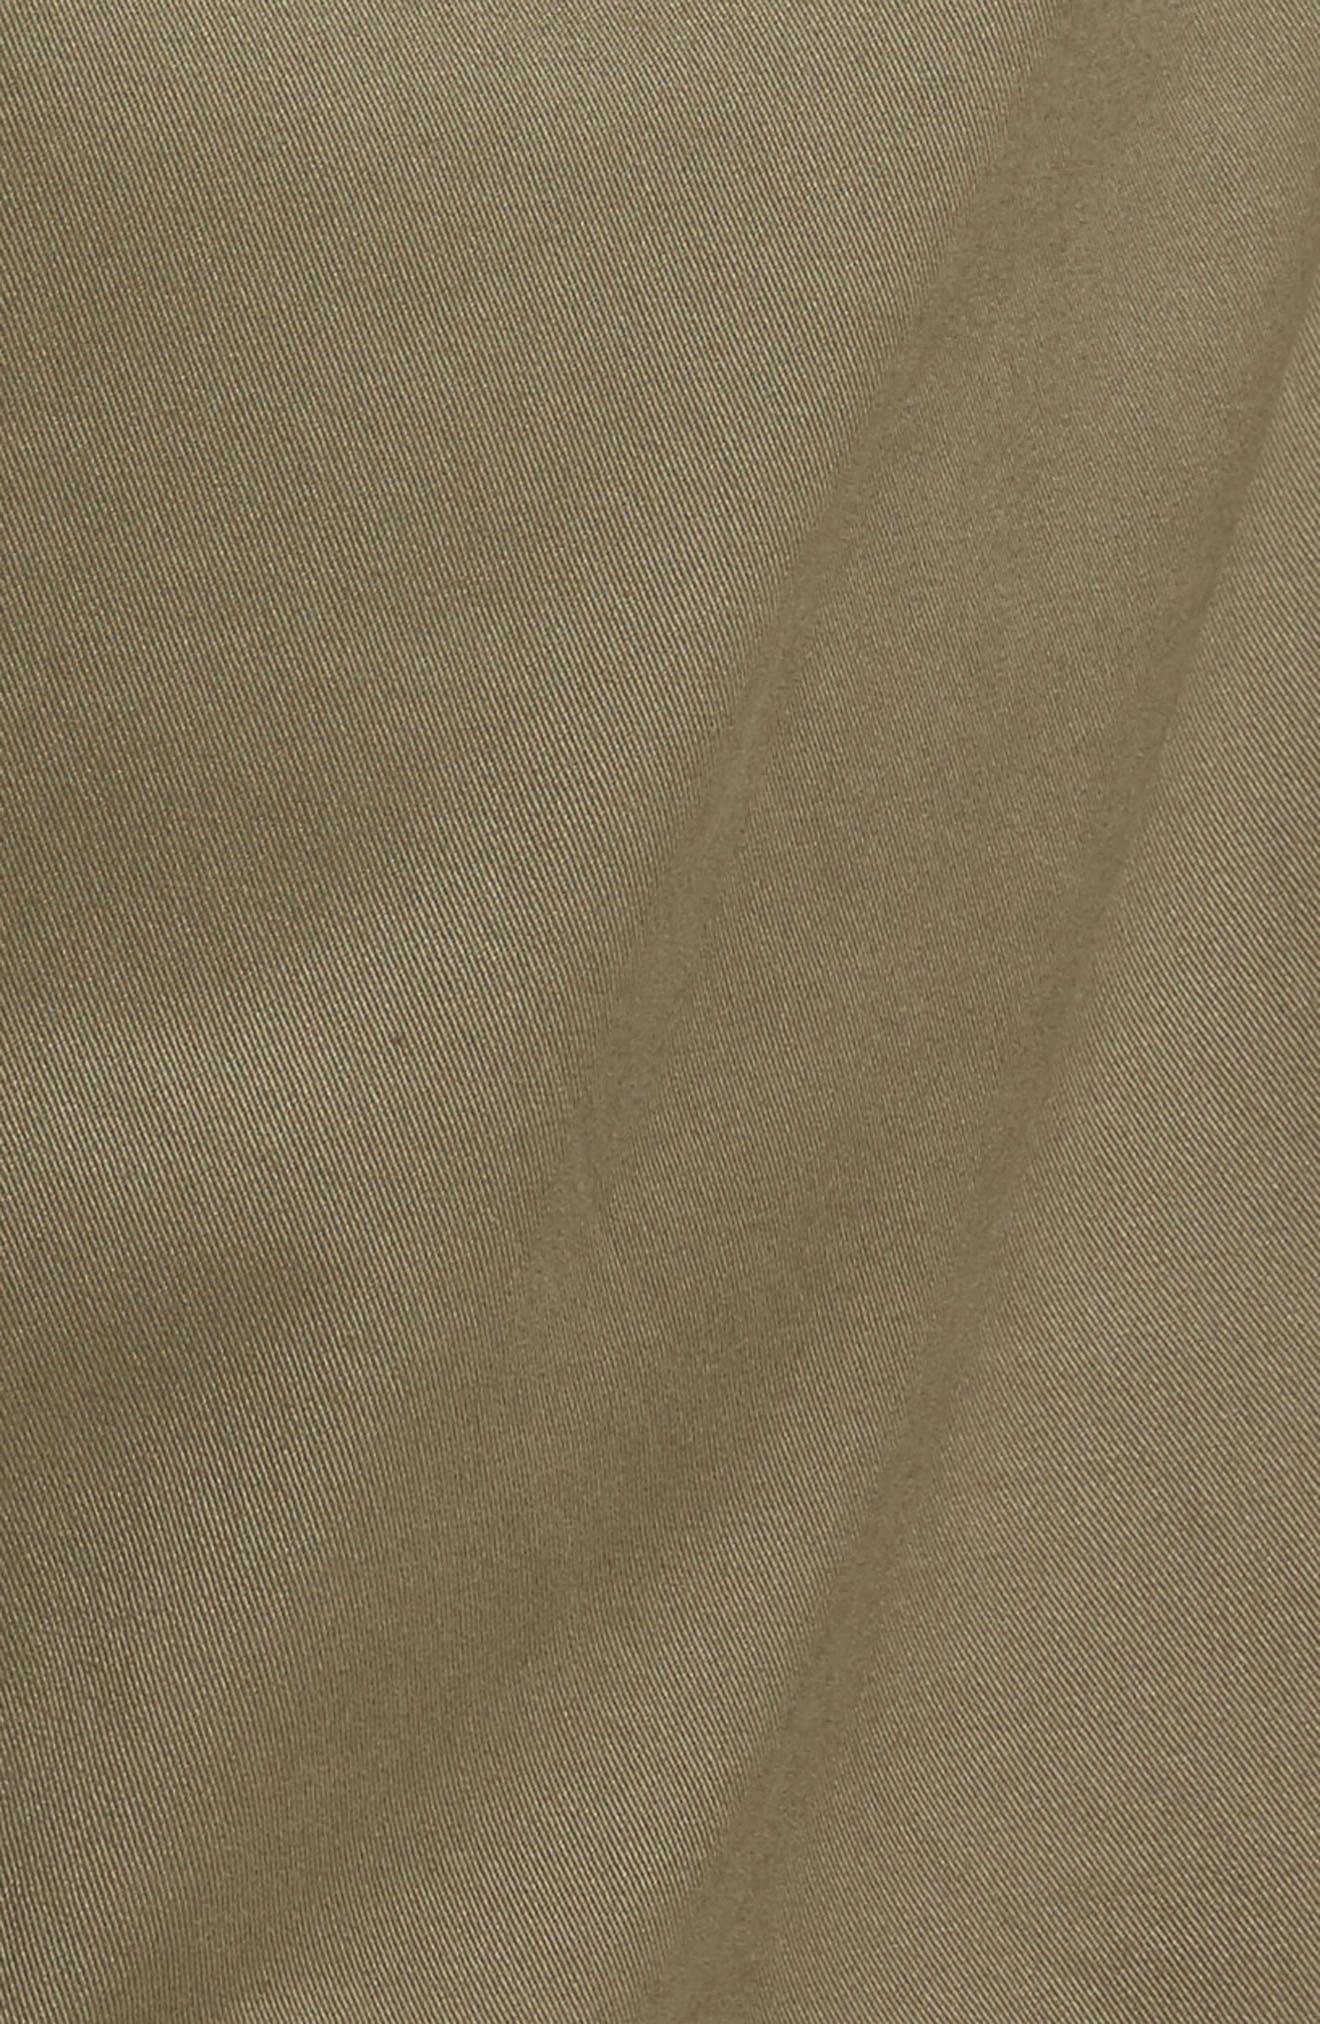 Ballard Slim Fit Stretch Chino 11-Inch Shorts,                             Alternate thumbnail 68, color,